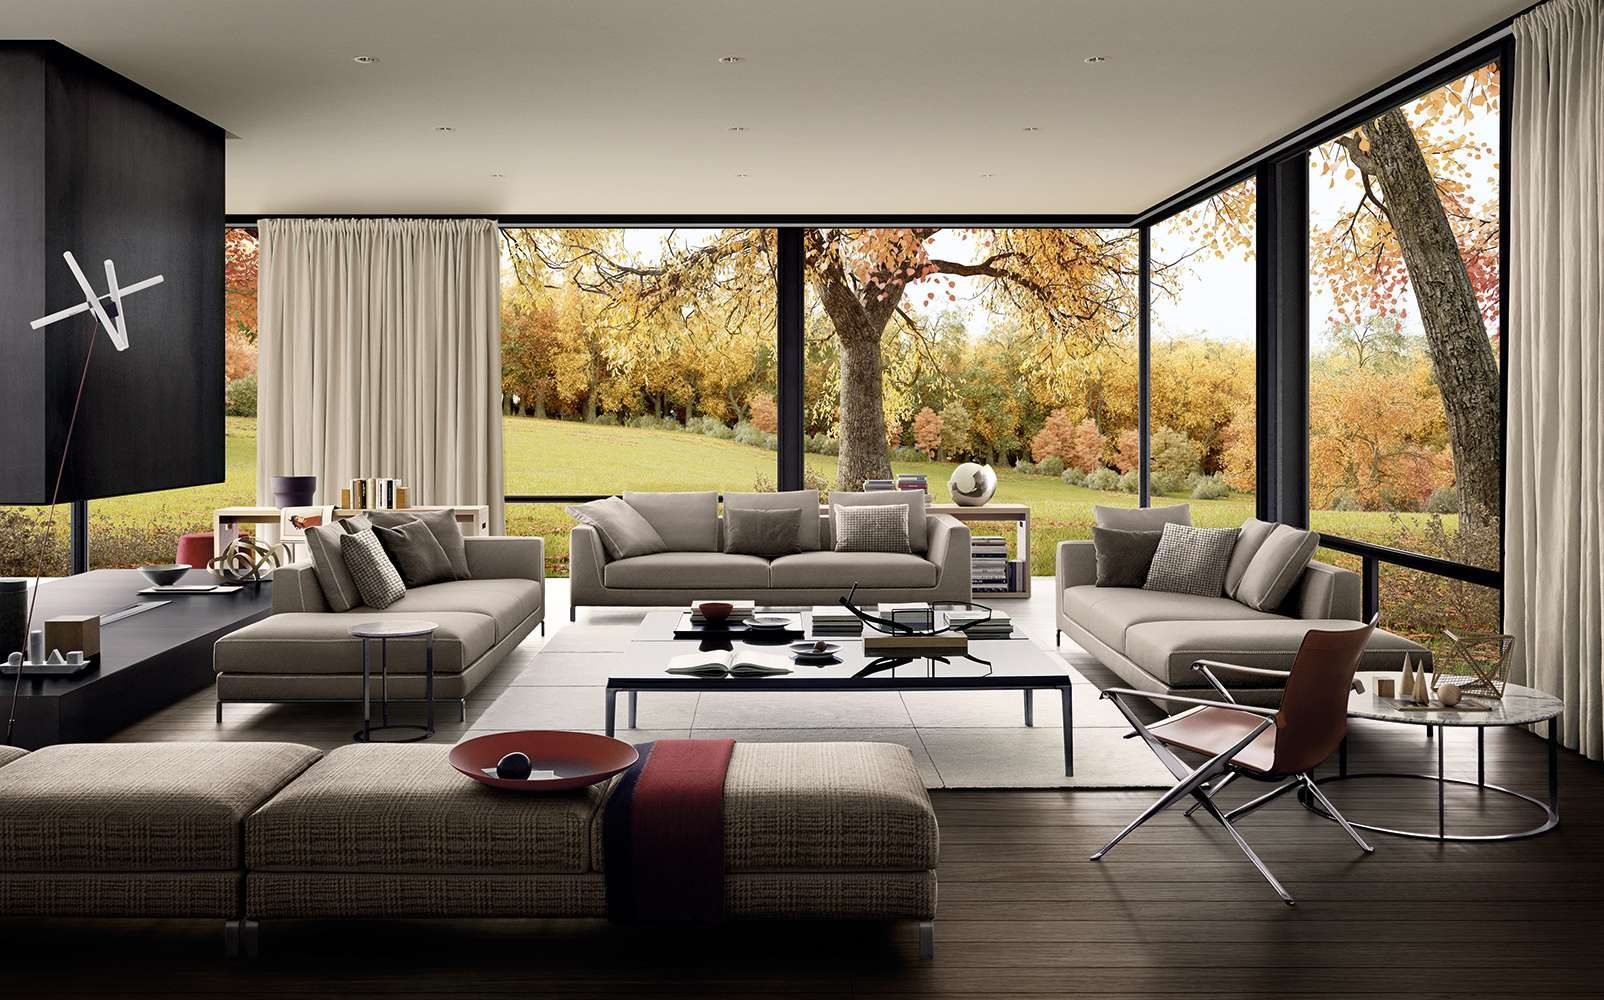 Pin de Mari Luz en Futura casa | Pinterest | Modelos de ventanas ...